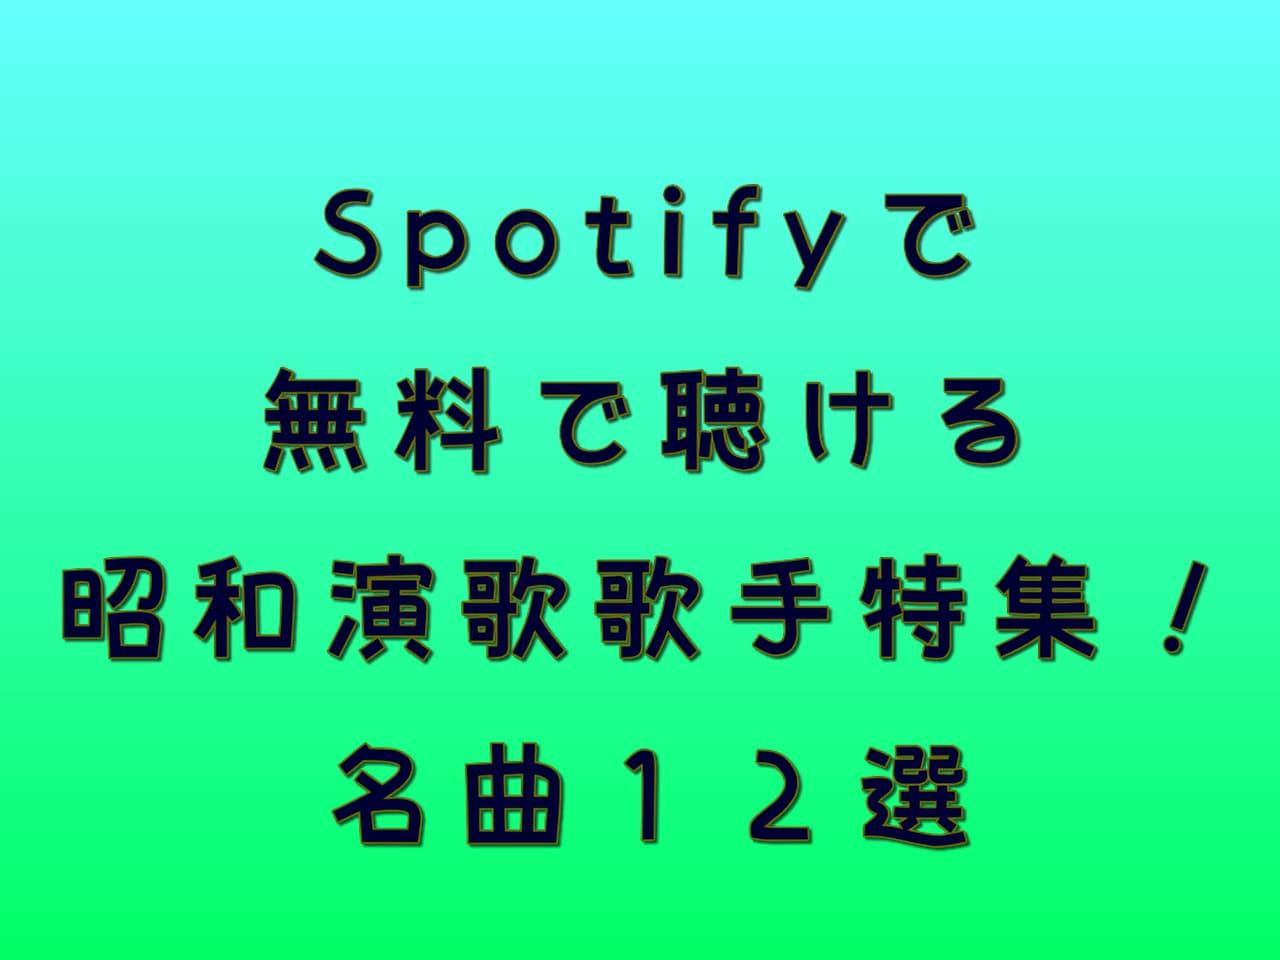 【Enka】Spotifyで無料で聴ける昭和演歌歌手特集!名曲12選【Saikooo!】